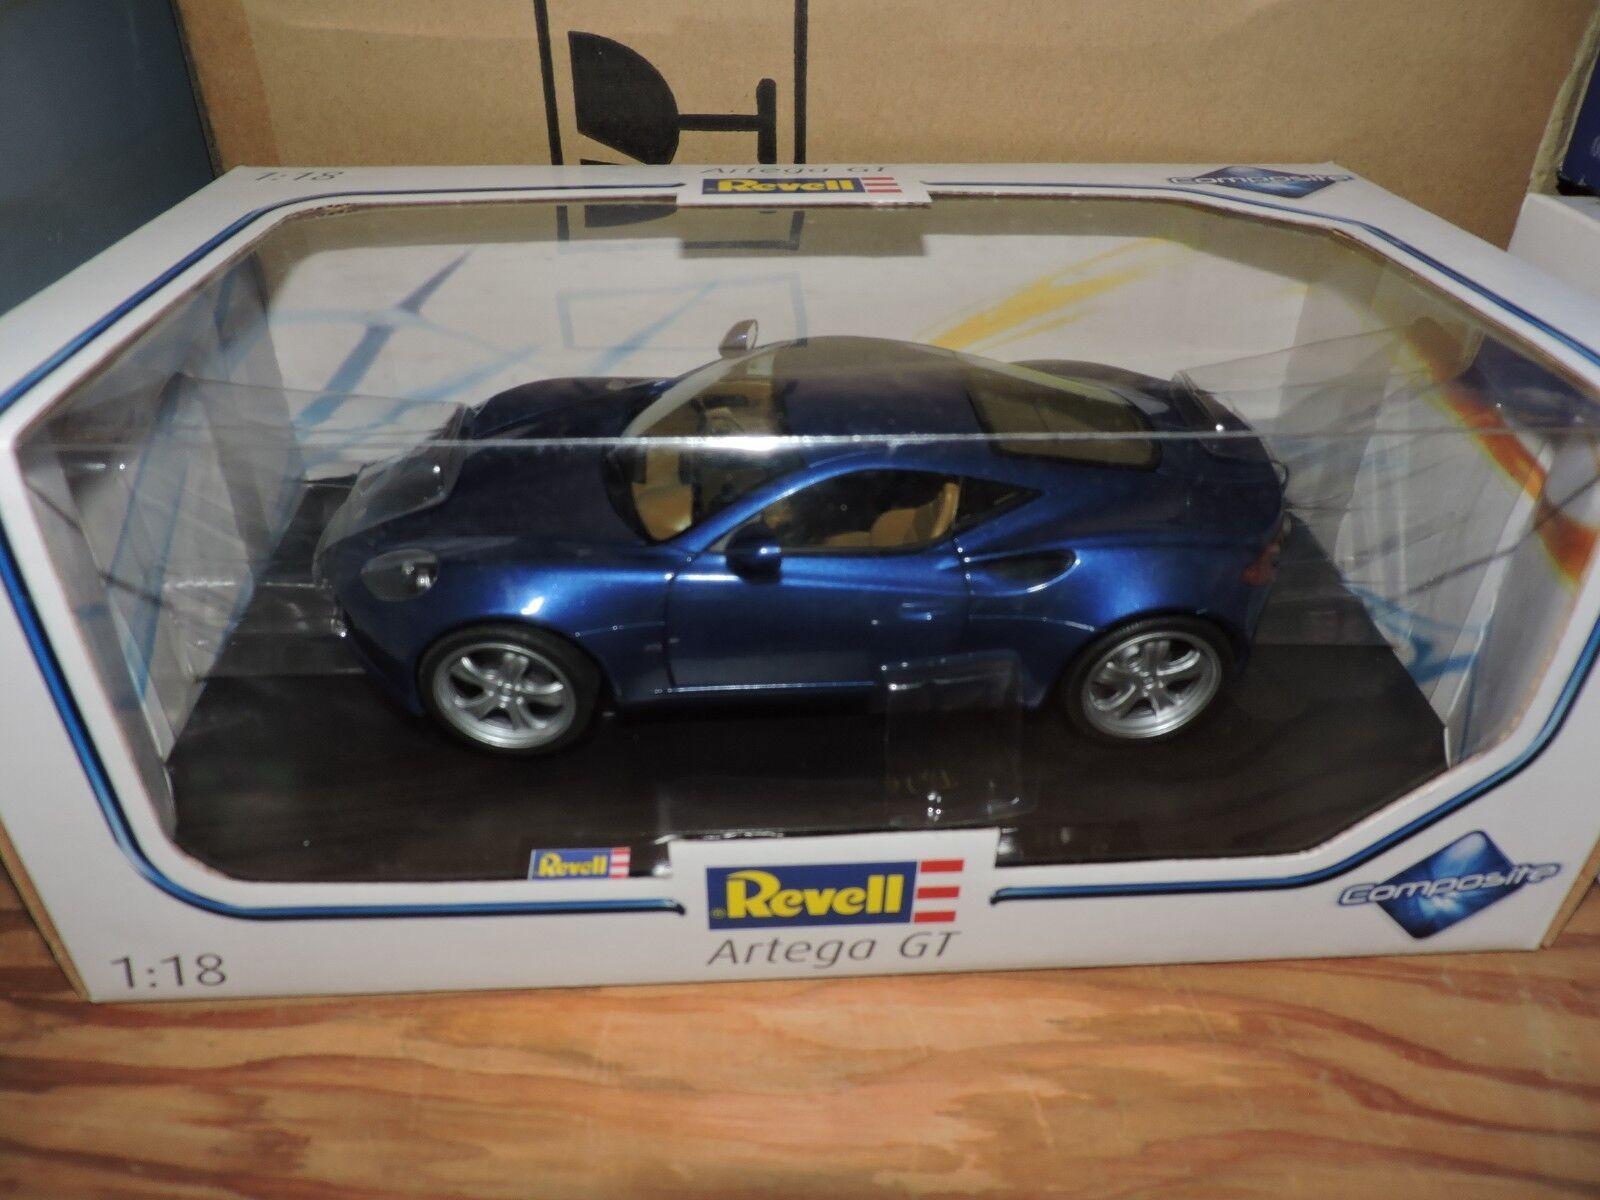 REVELL 1/18th SCALE DIE CAST BLUE ARTEGA GT # 09024